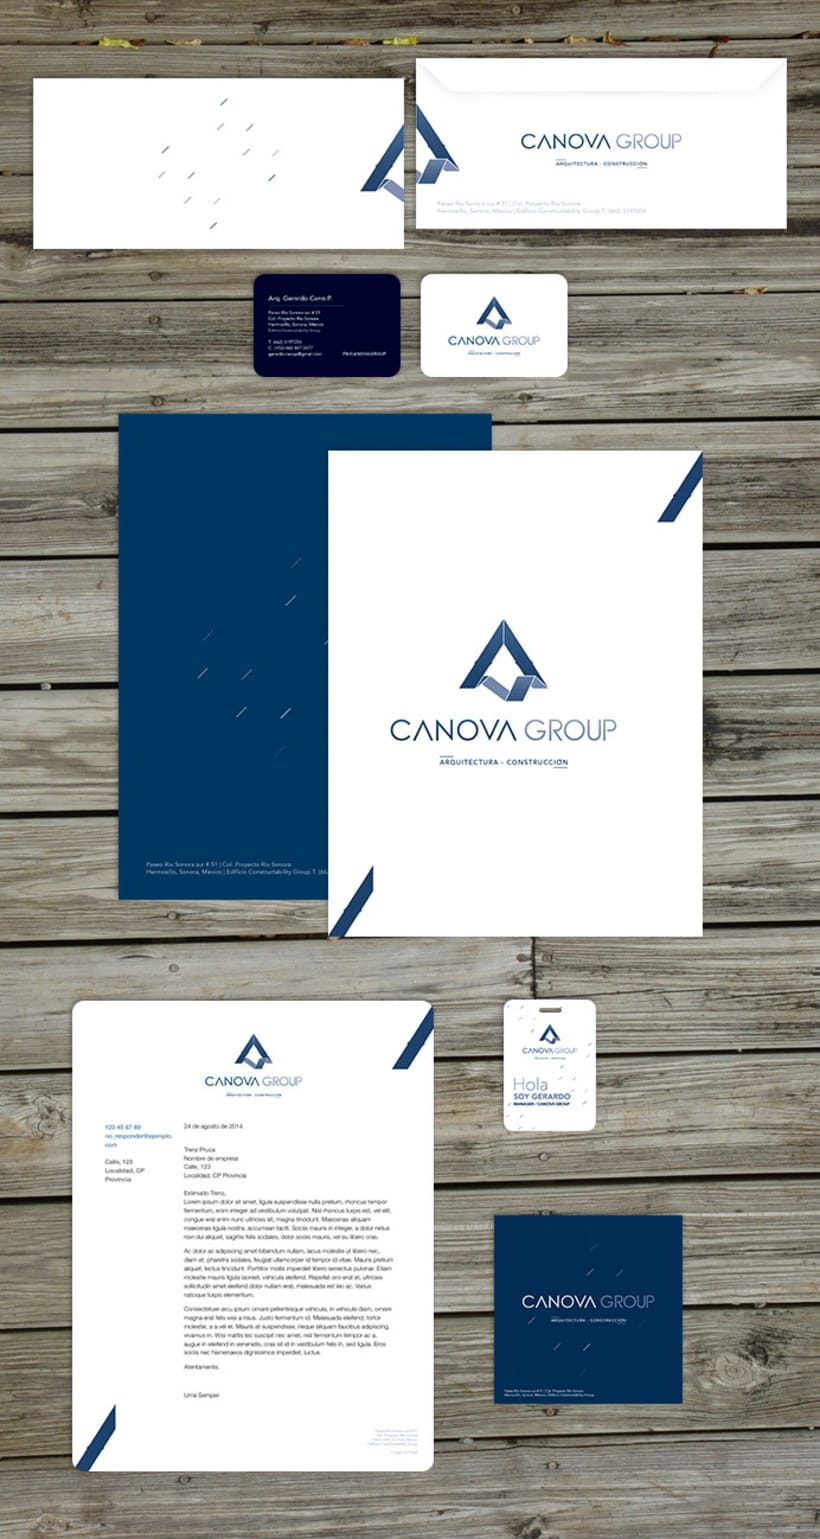 Canova Group 1